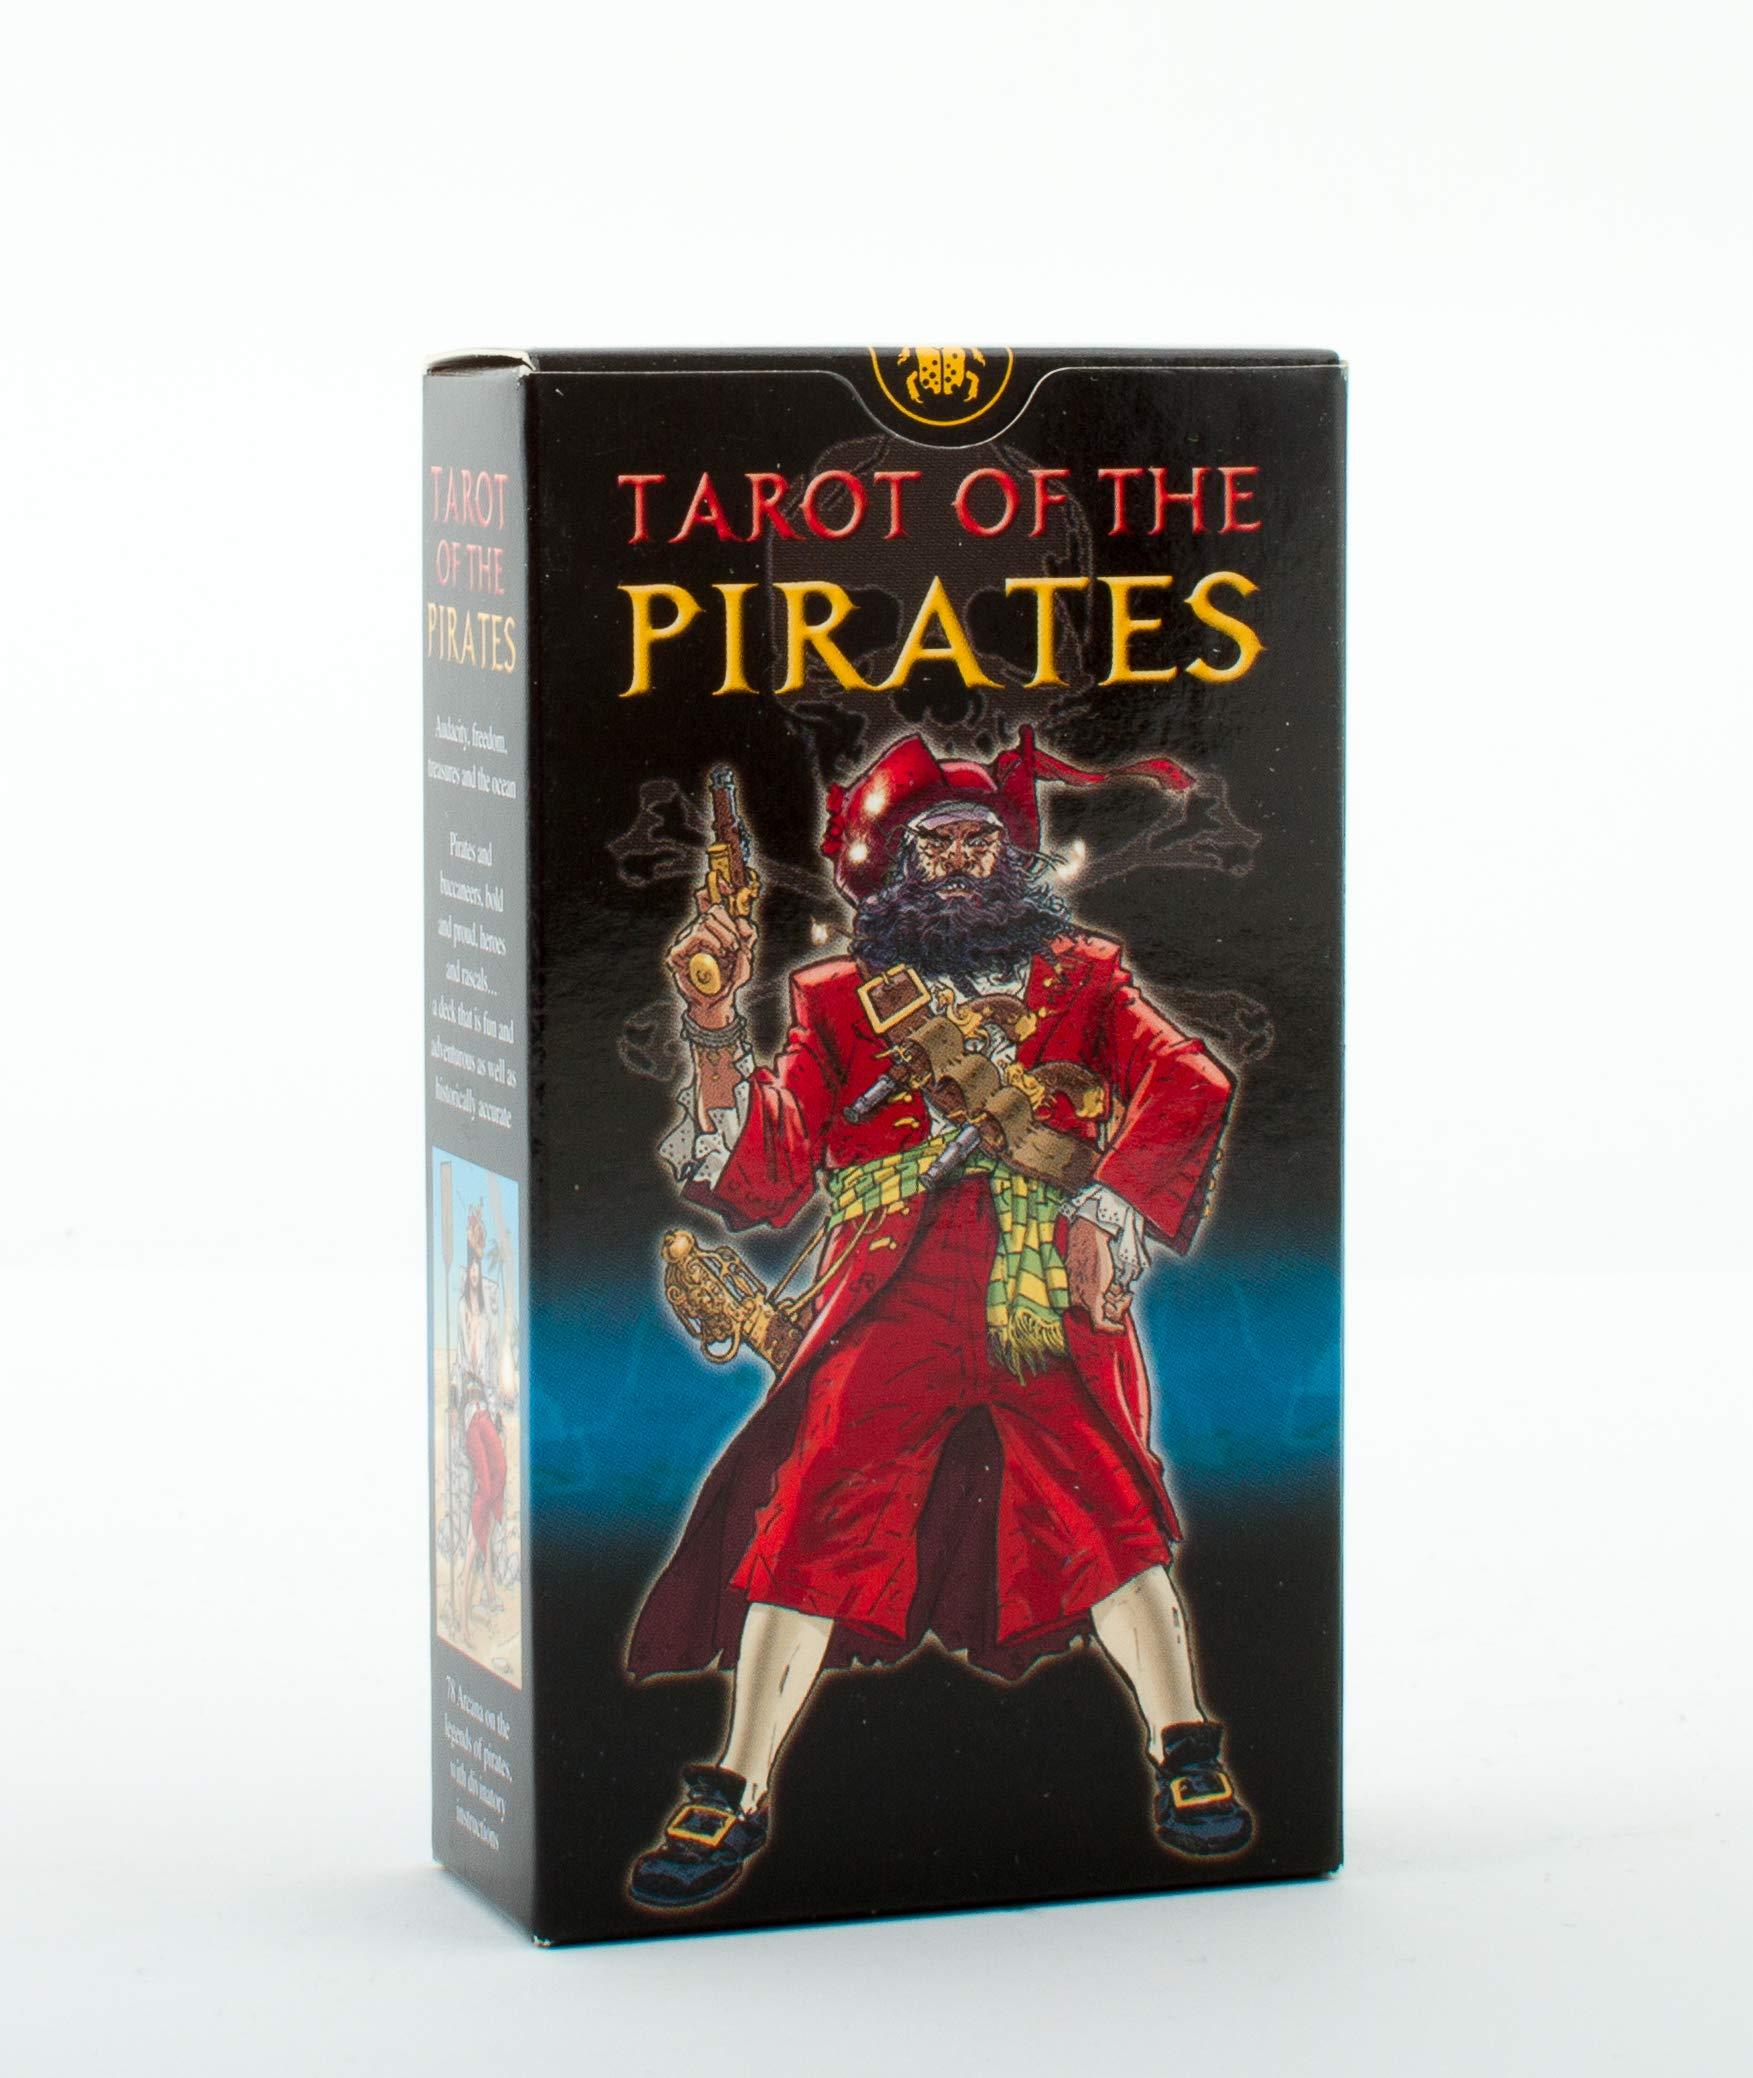 Tarot of the Pirates: Vigna, Bepi and Arturo Picca: 9788883957444:  Amazon.com: Books